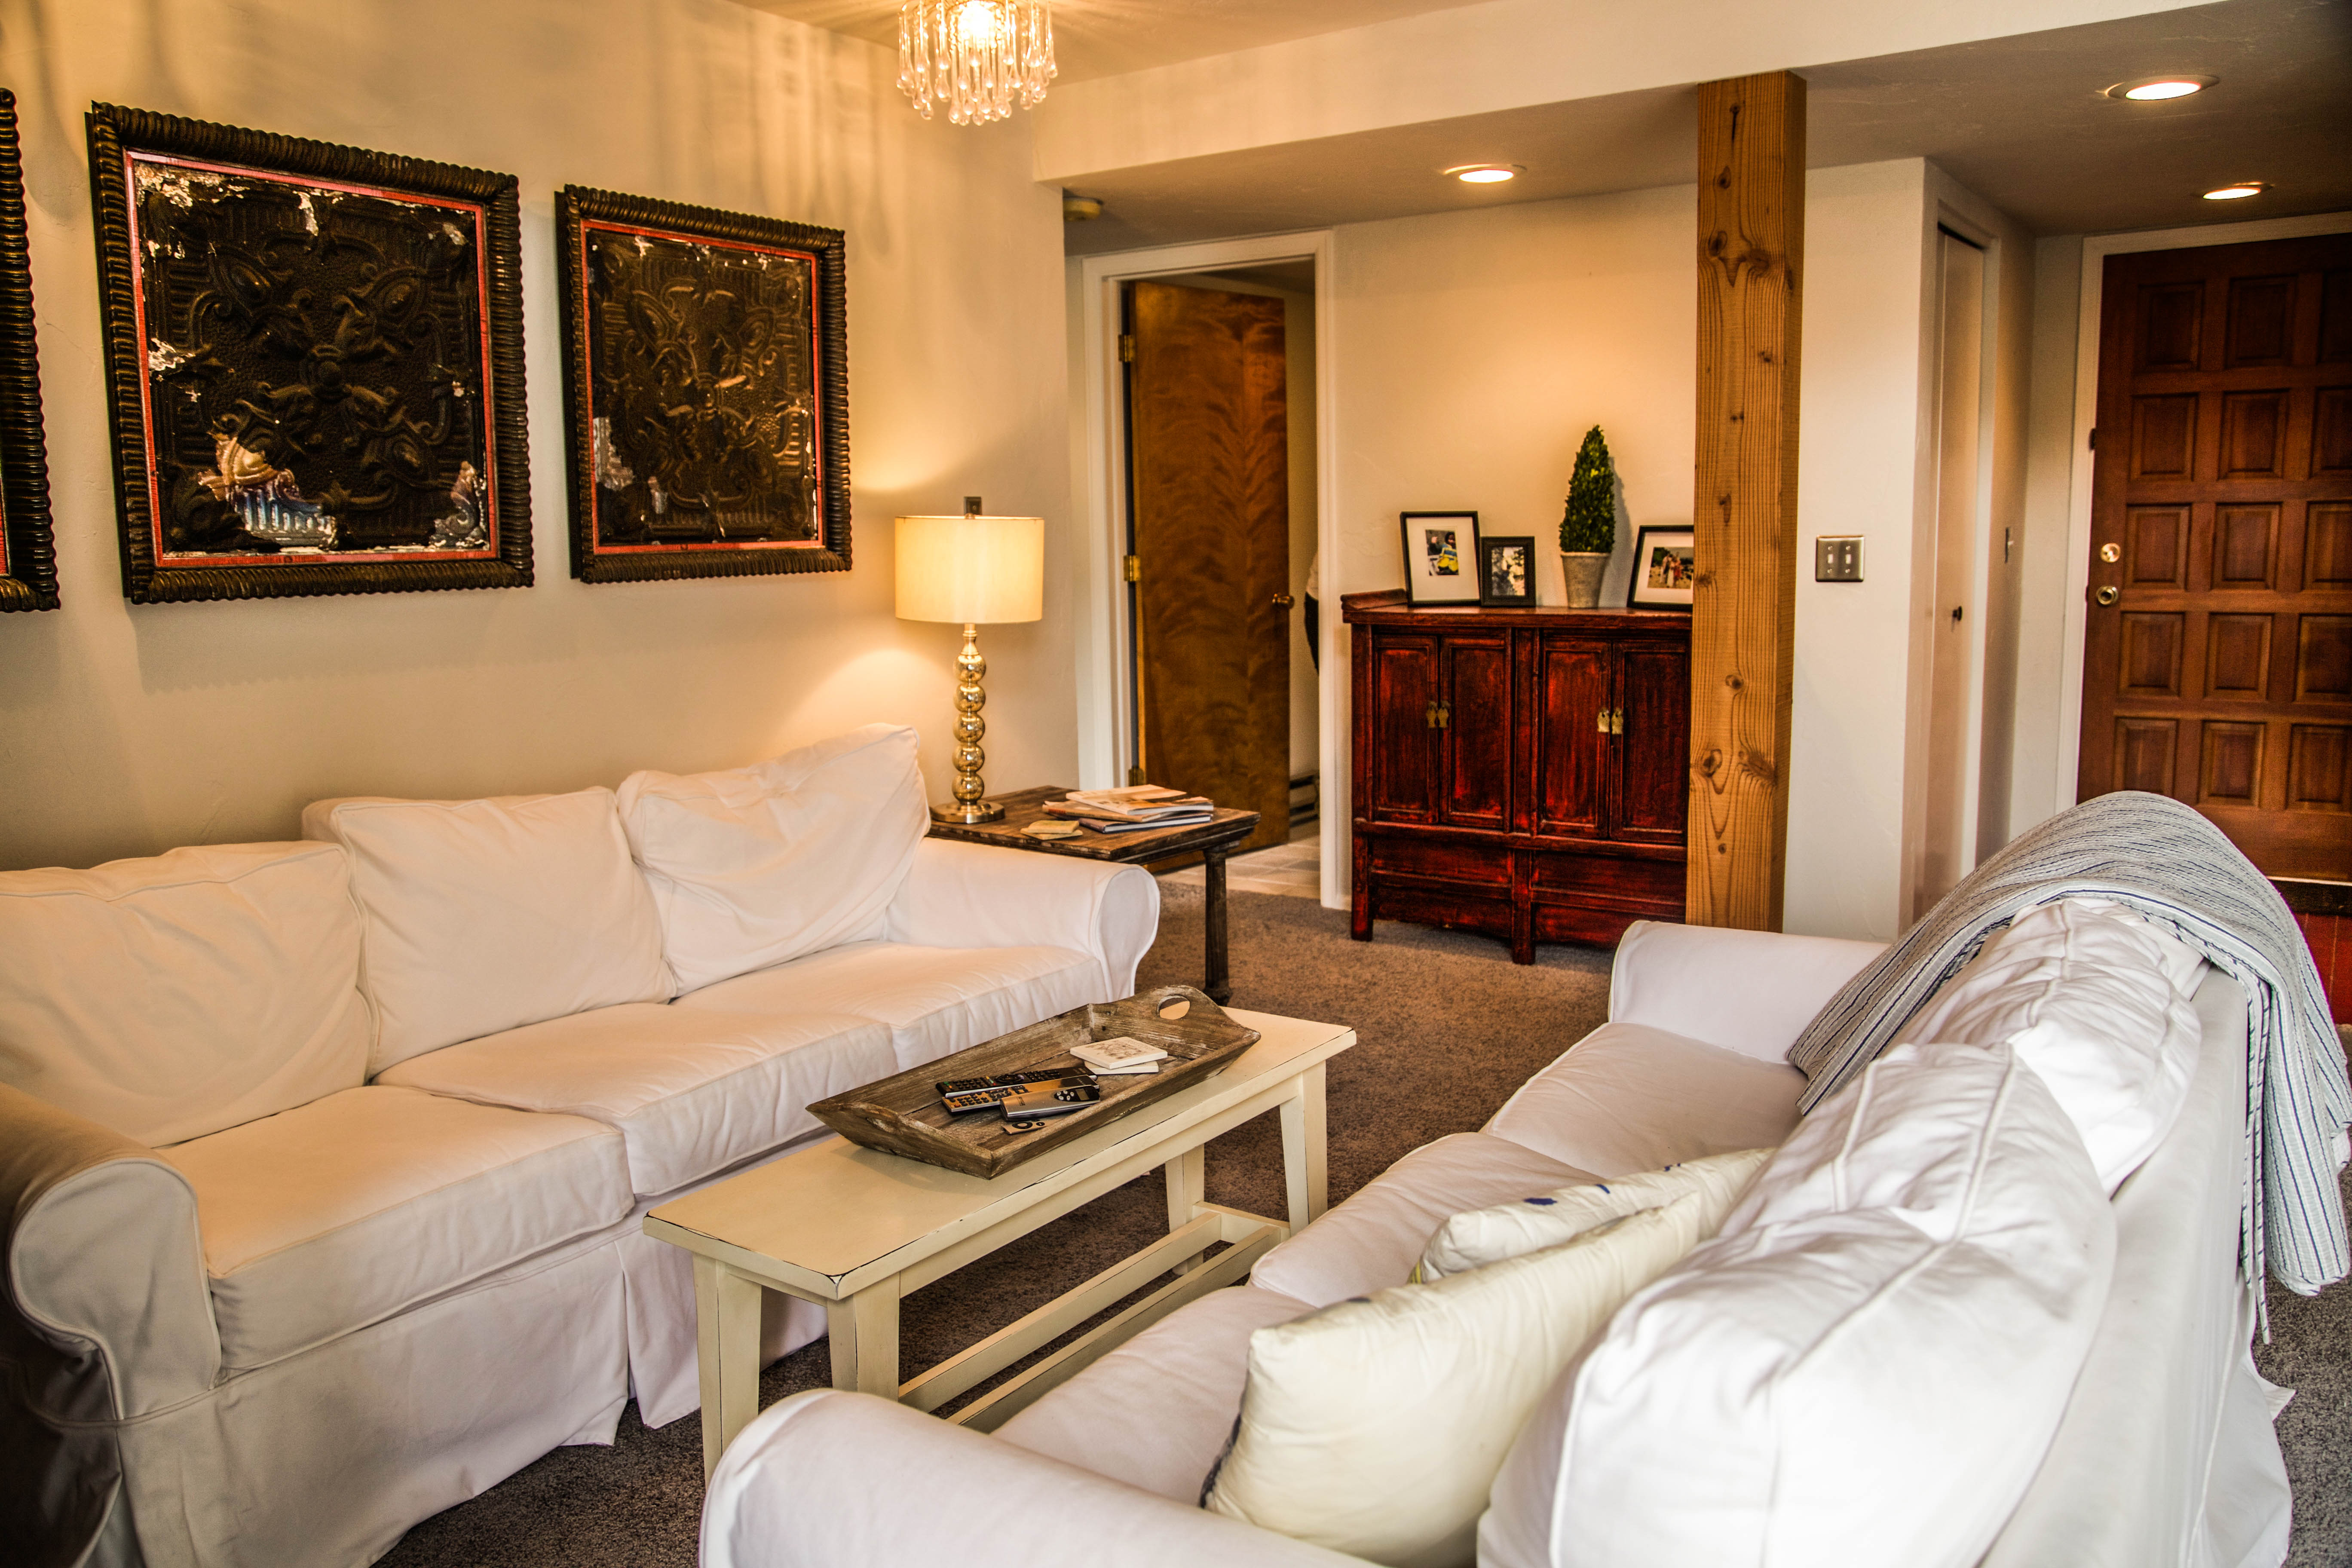 Condomínio para Venda às 270 Bridge Street, Unit 301 270 Bridge St Bigfork, Montana, 59911 Estados Unidos